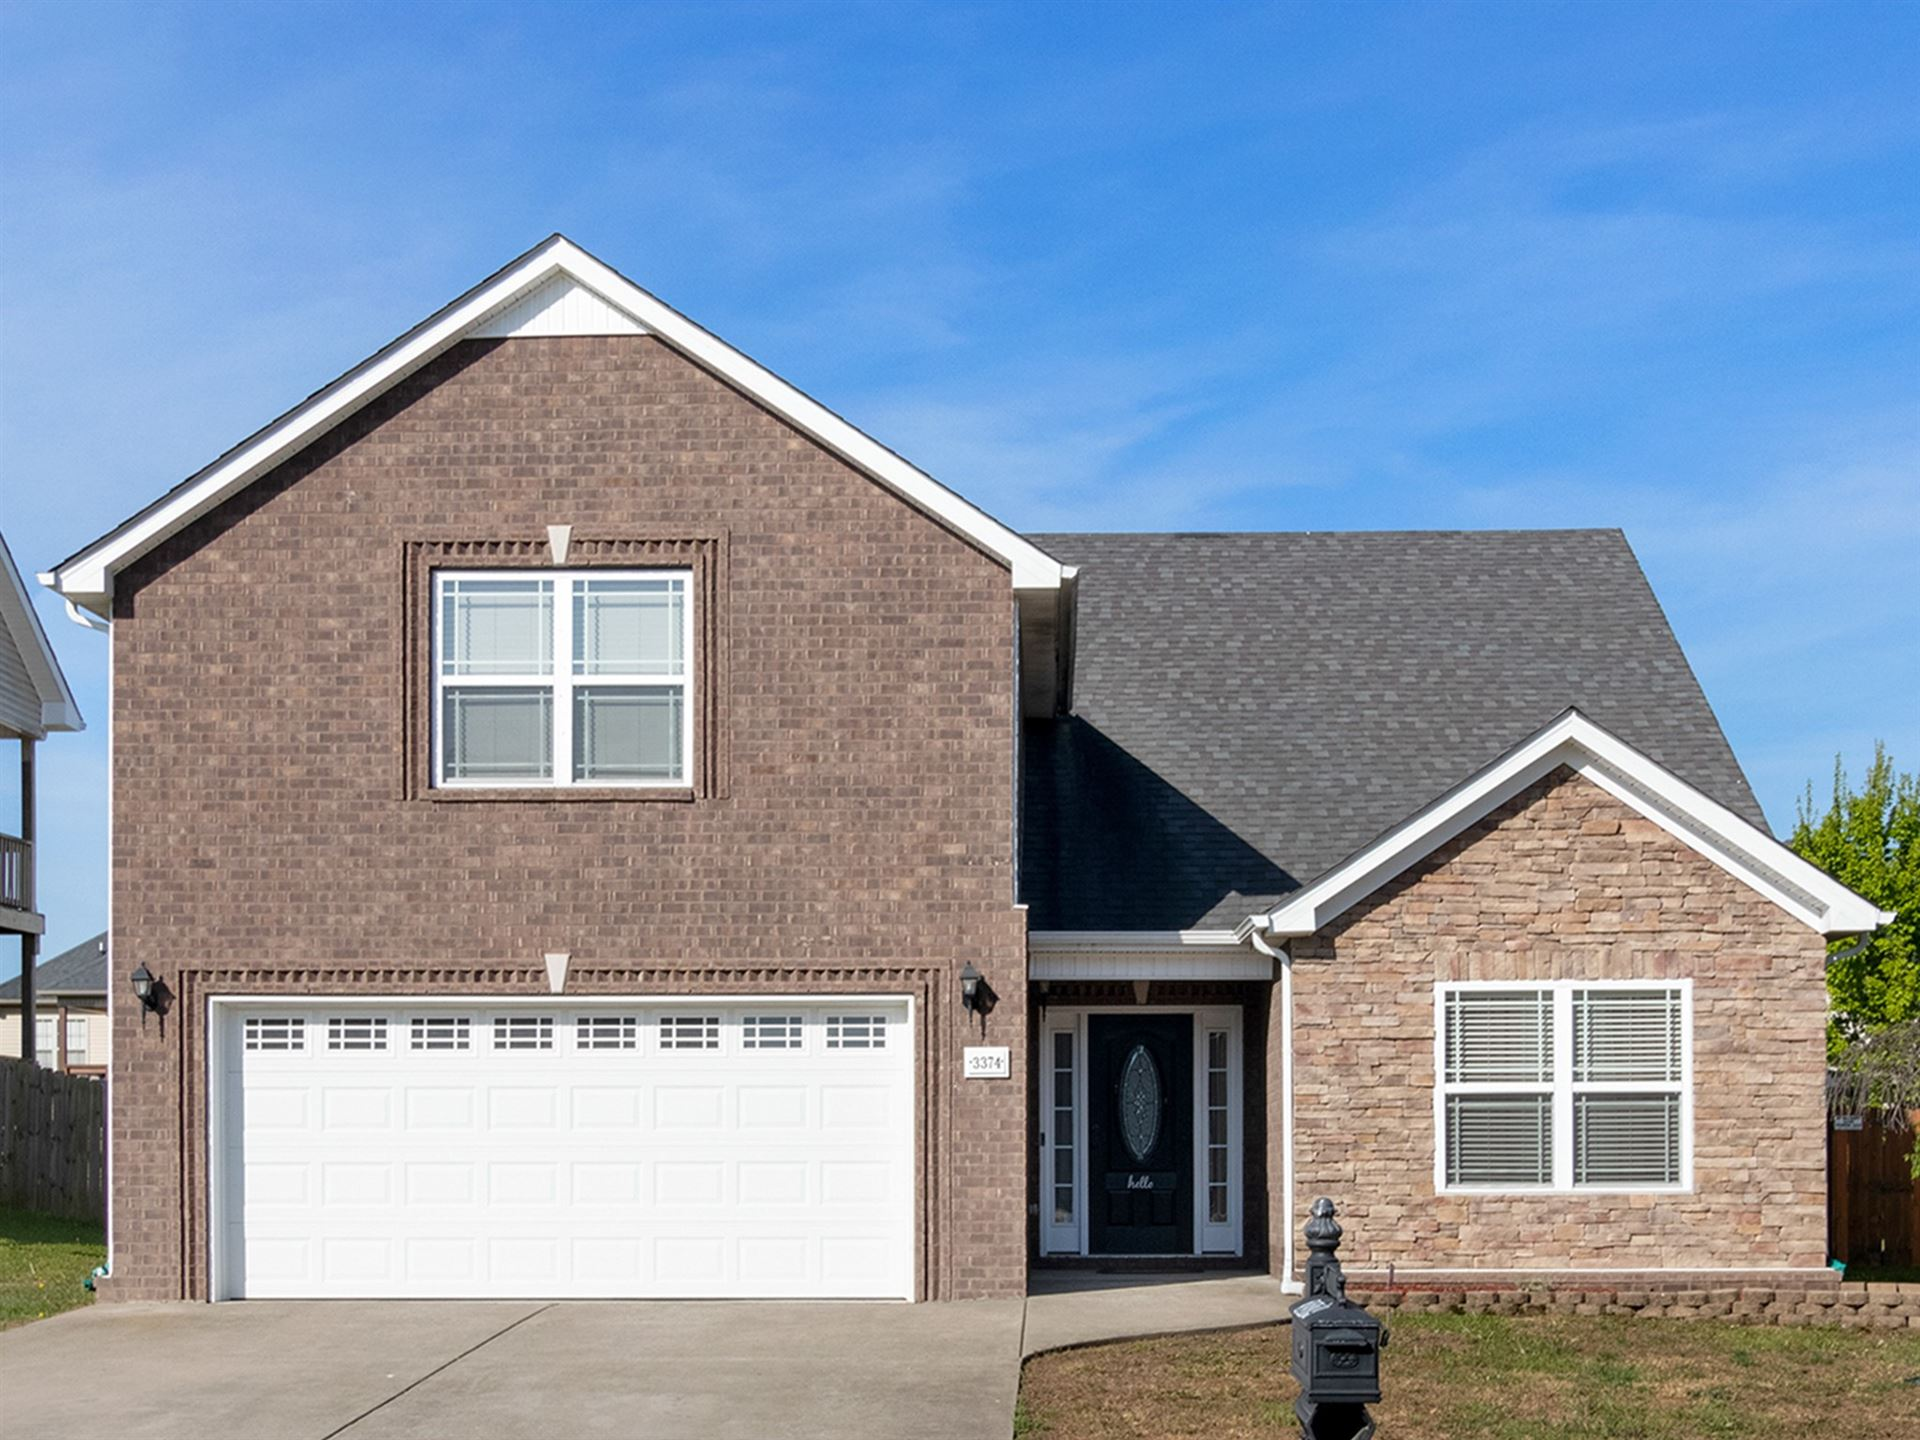 3374 Cotham Ln, Clarksville, TN 37042 - MLS#: 2251779